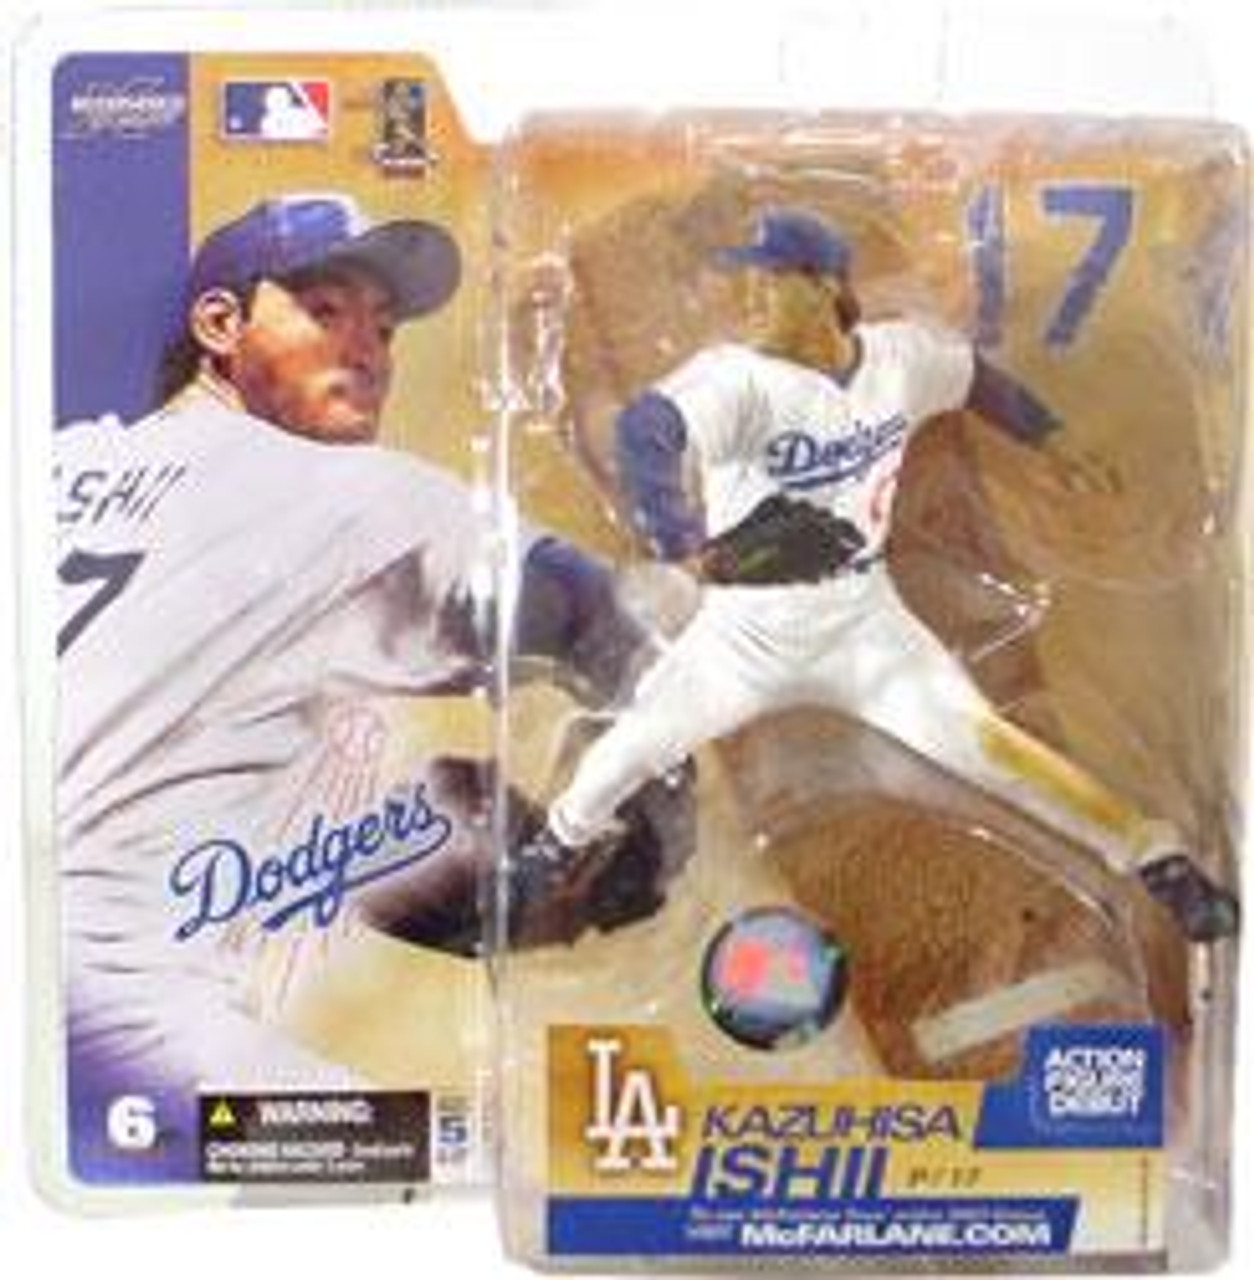 McFarlane Toys MLB Los Angeles Dodgers Sports Picks Series 6 Kazuhisa Ishii Action Figure [White Jersey]